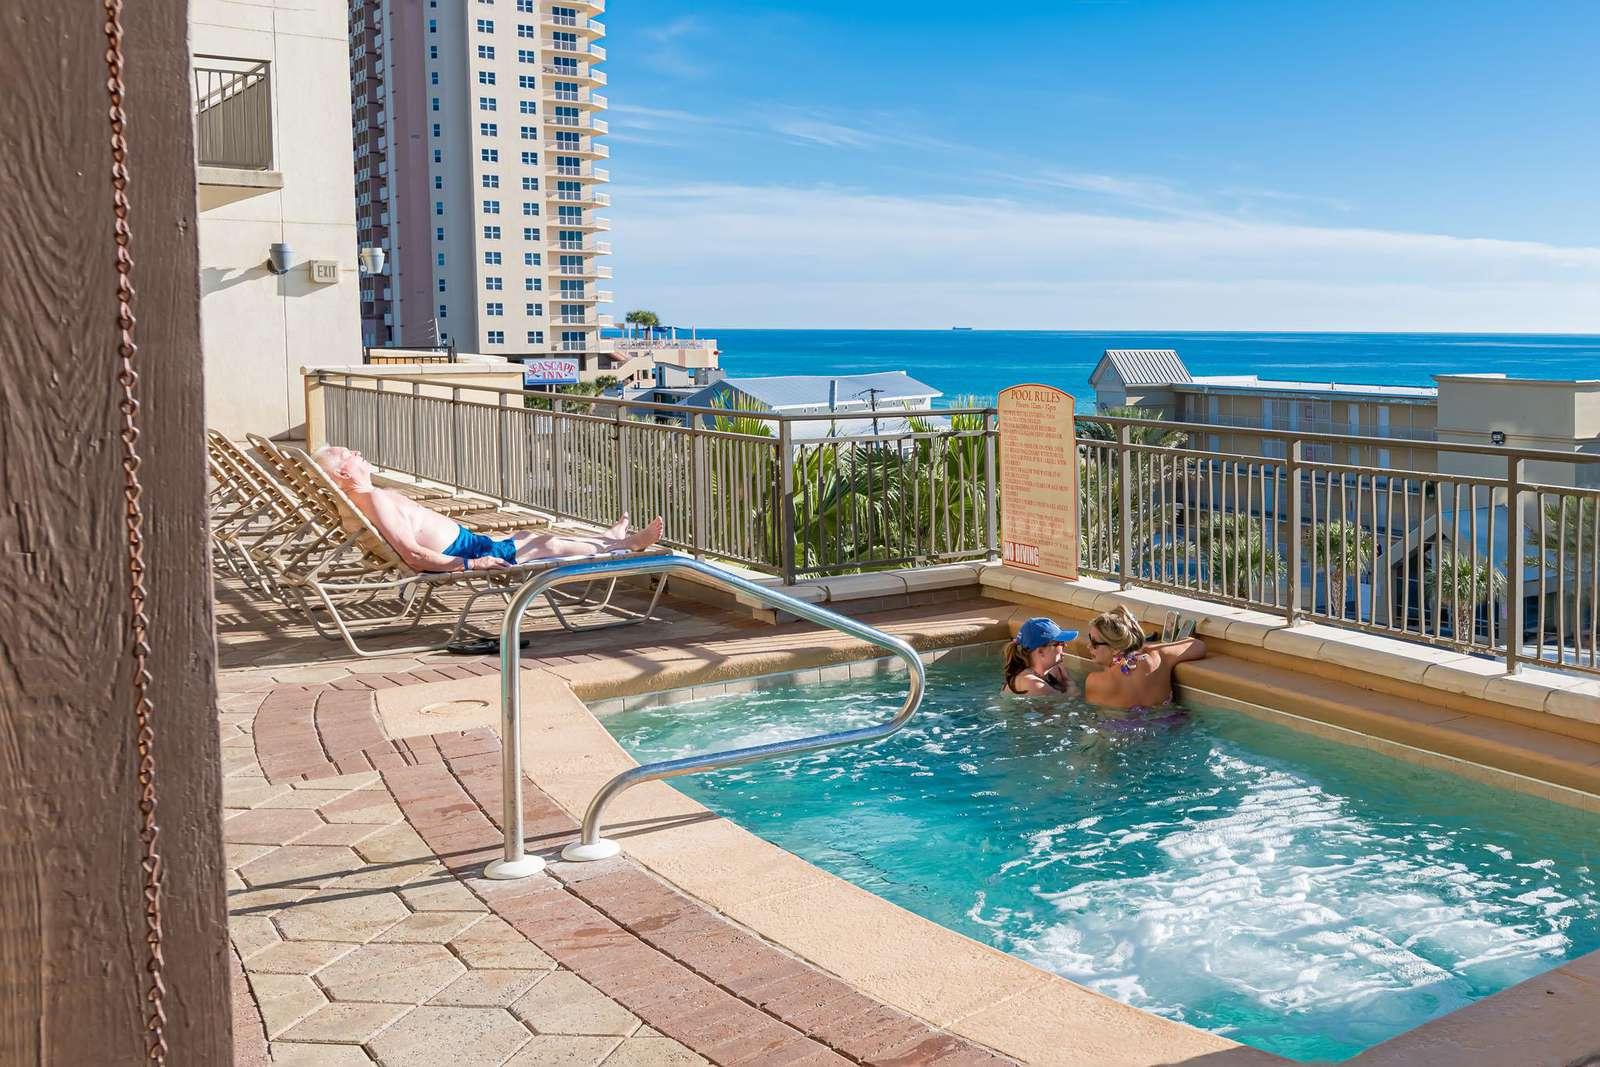 Spacious hot tub with beach views on the 4th floor!